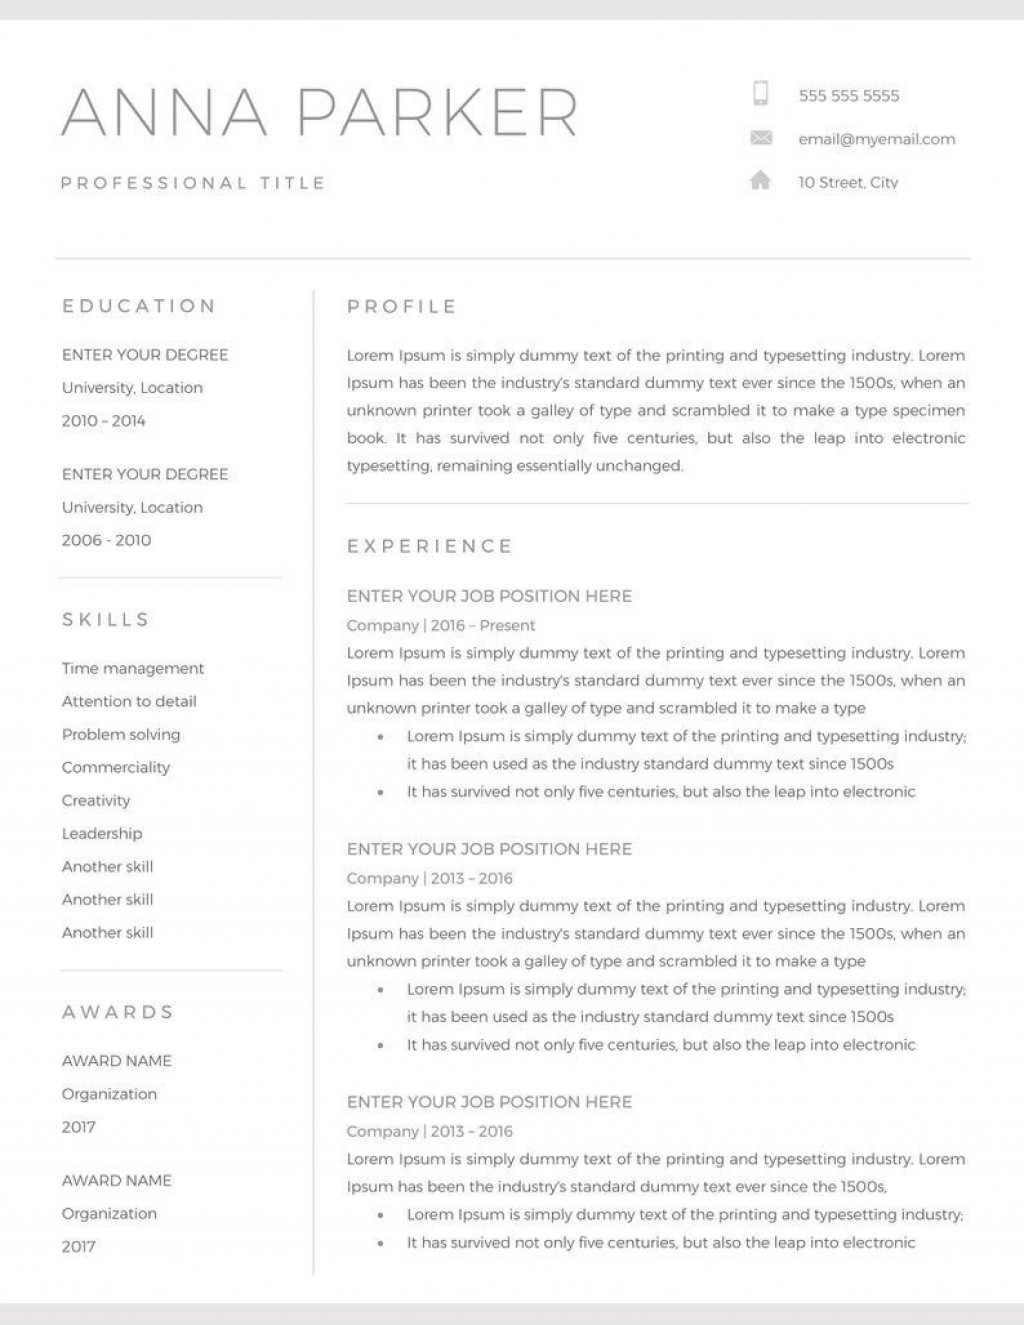 001 Astounding Resume Microsoft Word Template High Resolution  Cv/resume Design Tutorial With Federal DownloadLarge